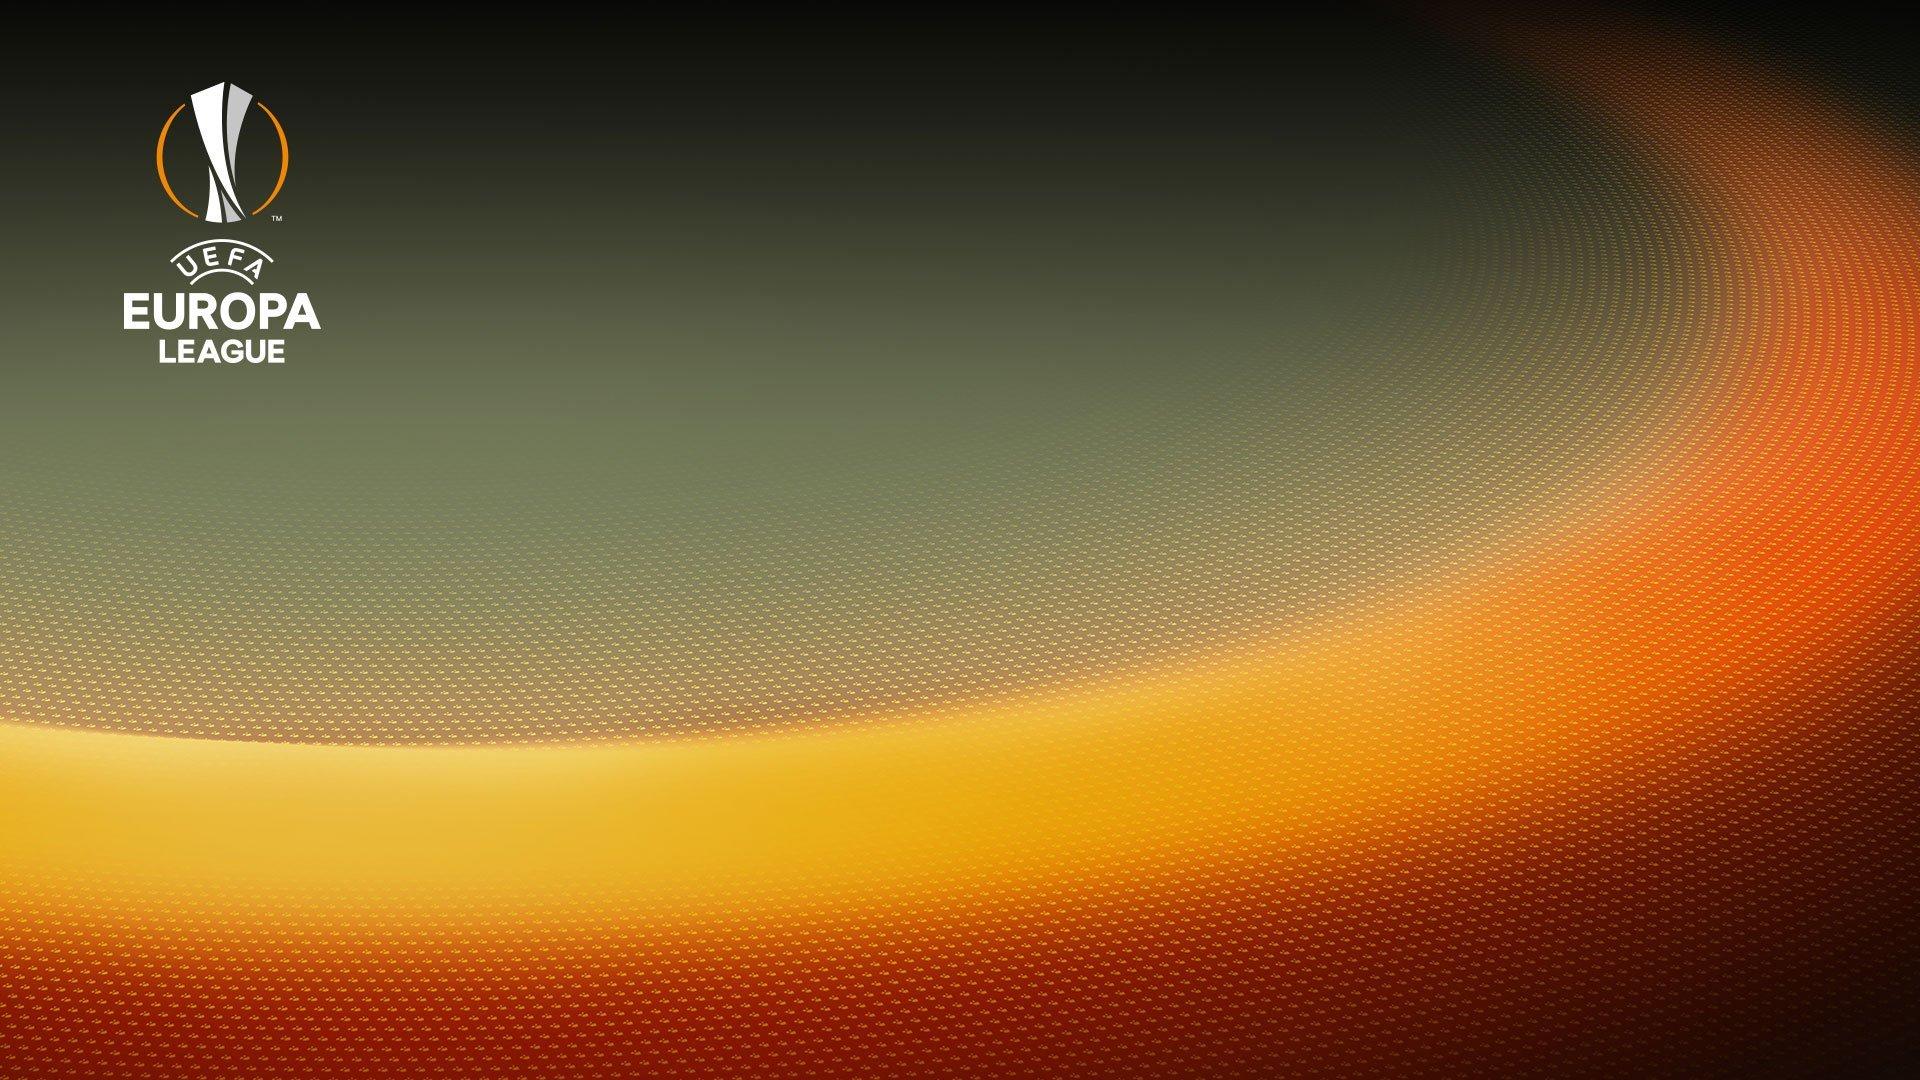 Прогноз на Лигу Европы: Дандолк – Левадия – 19 июля 2018 года